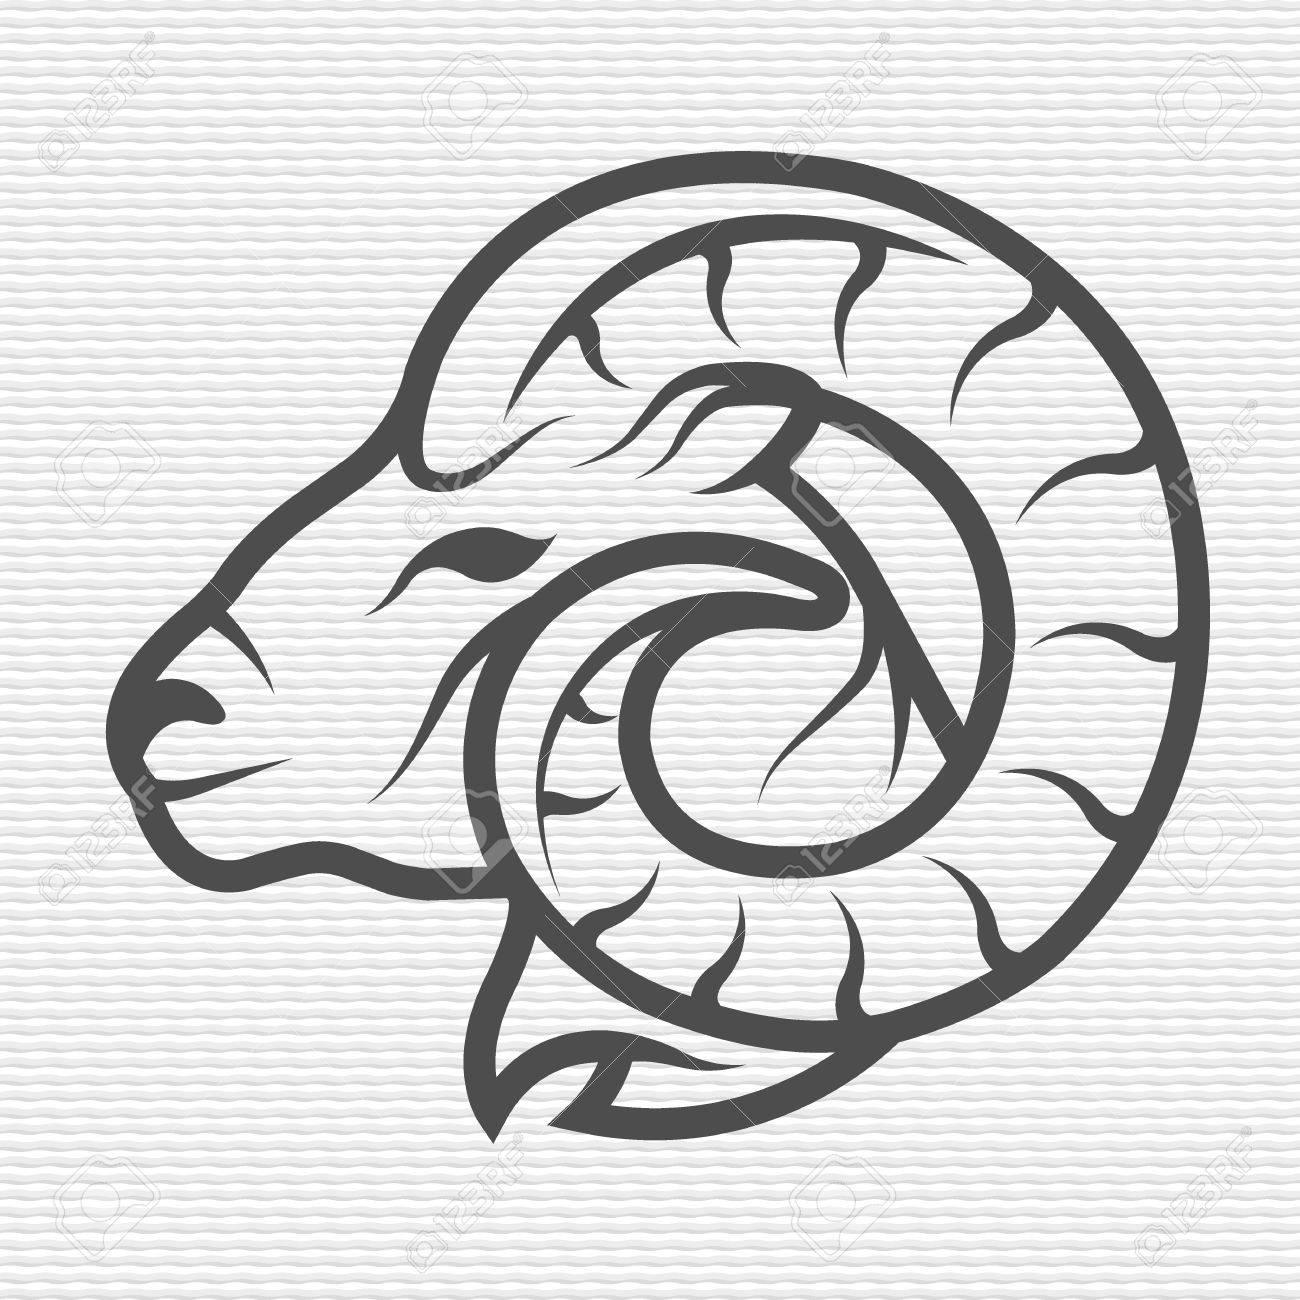 Ram symbol emblem Contour Design - 44321743